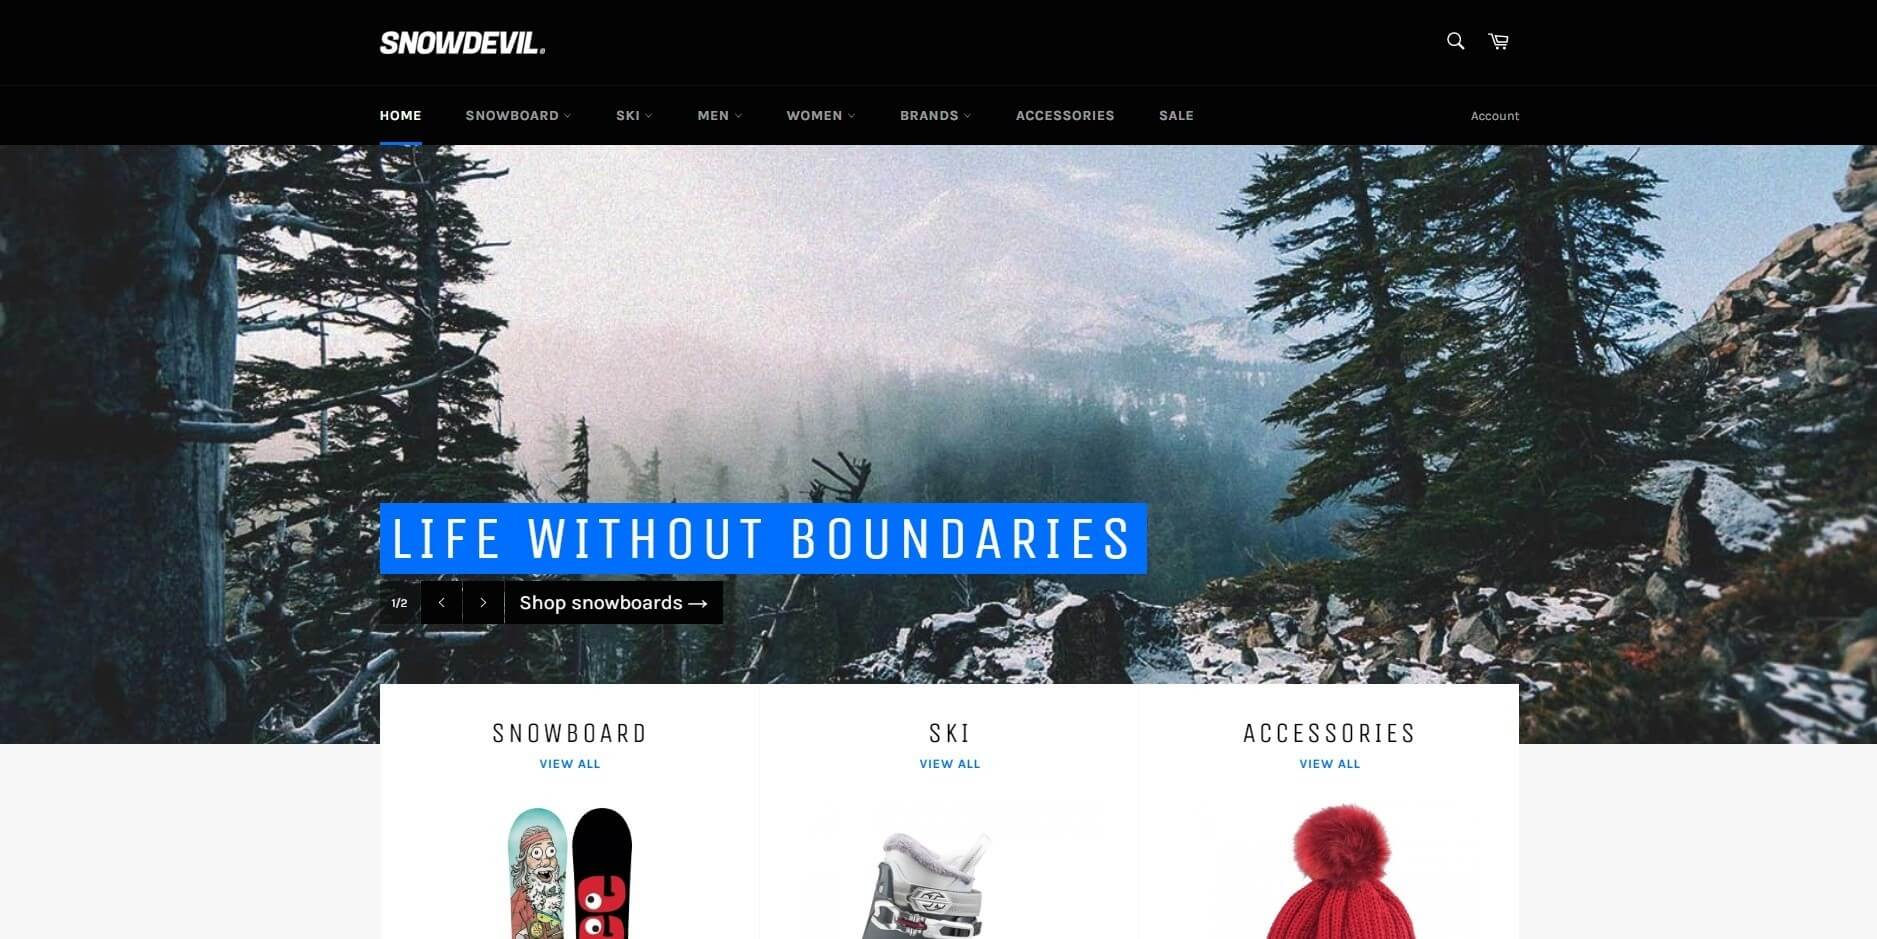 Venture shopify theme image